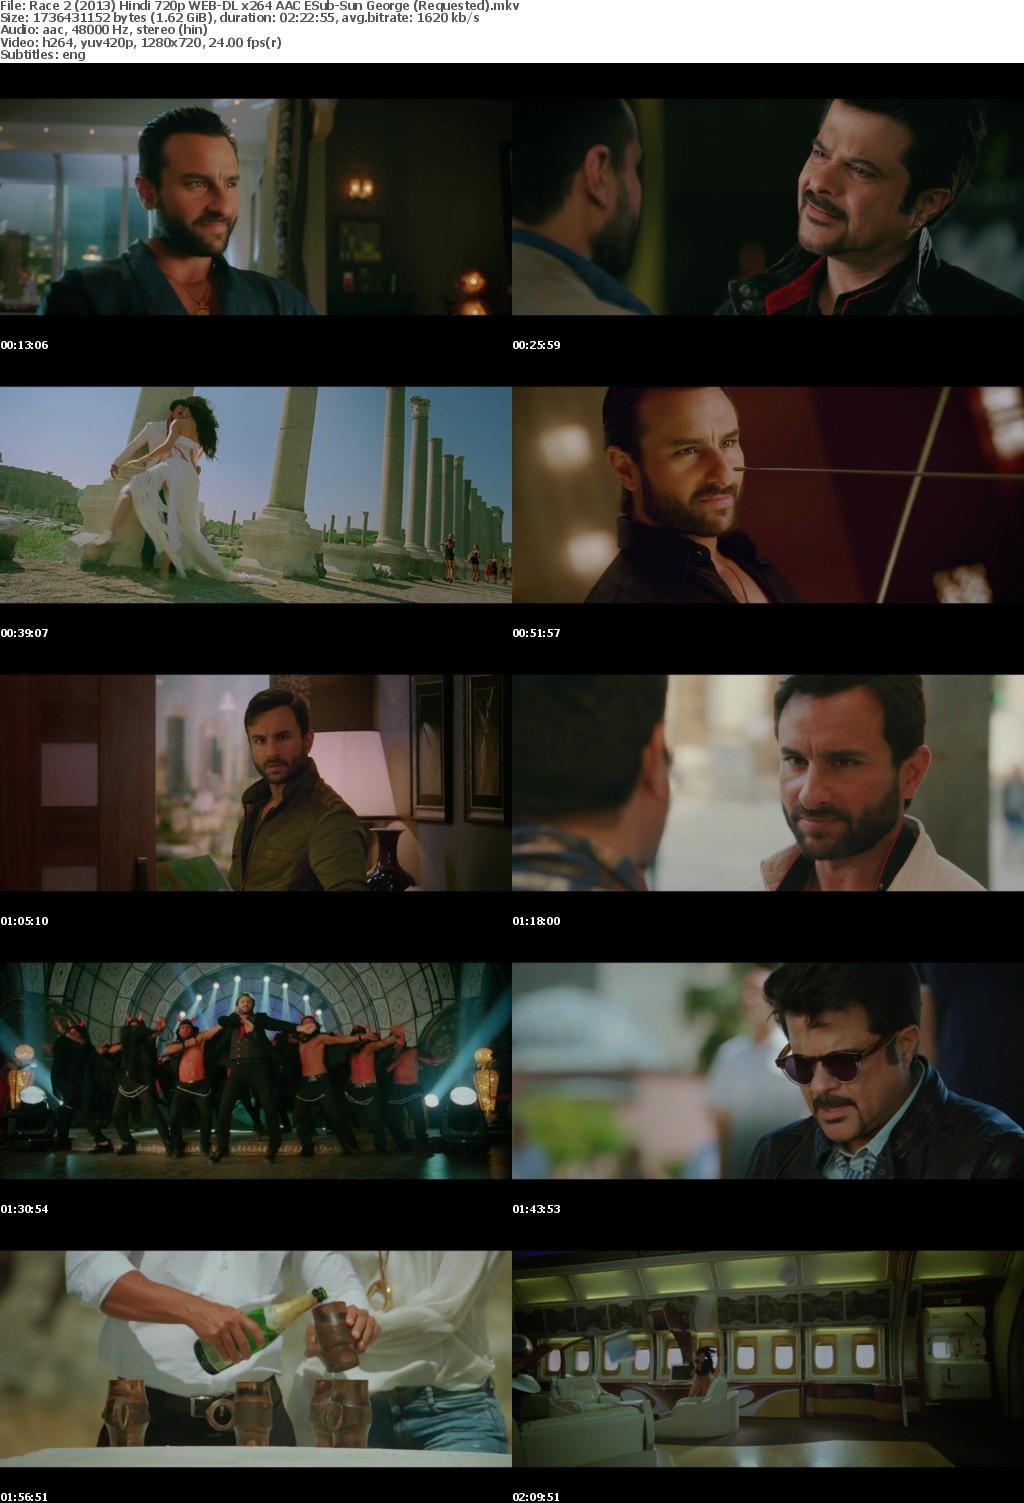 Race 2 (2013) Hindi 720p WEB-DL x264 AAC ESub-Sun George (Requested)